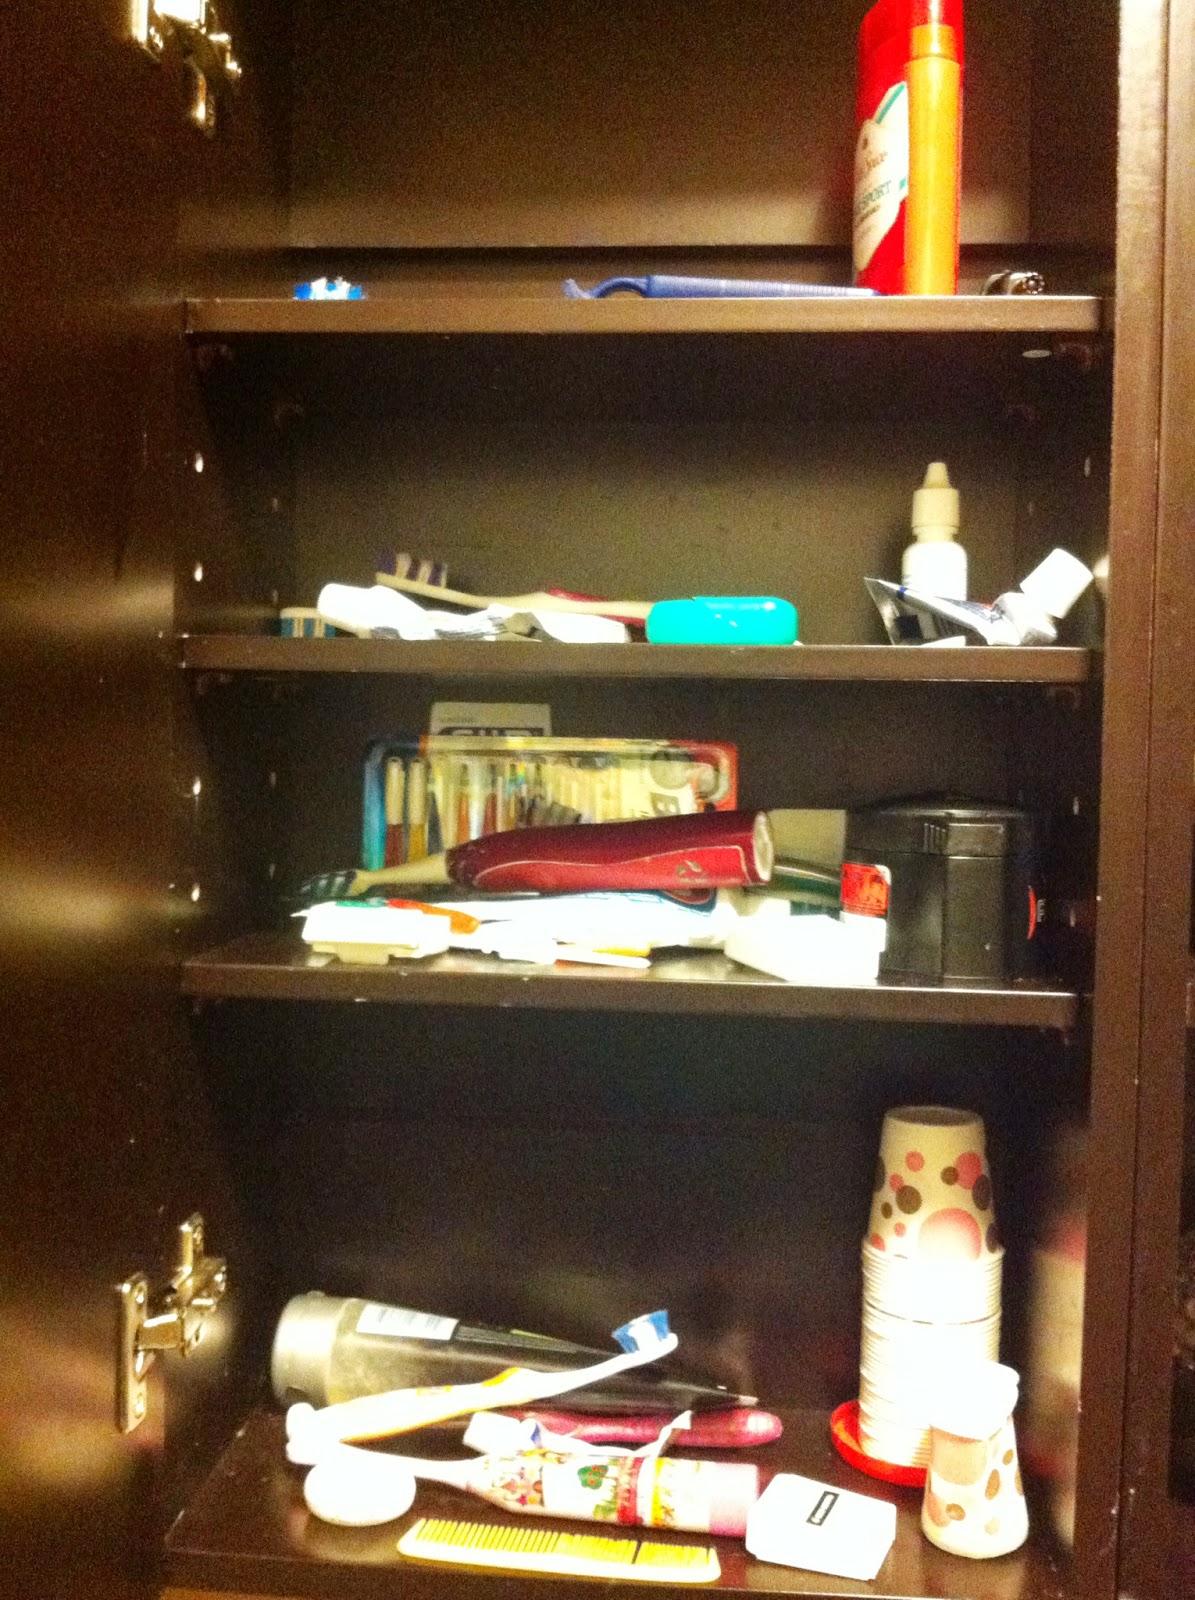 Basically Organized